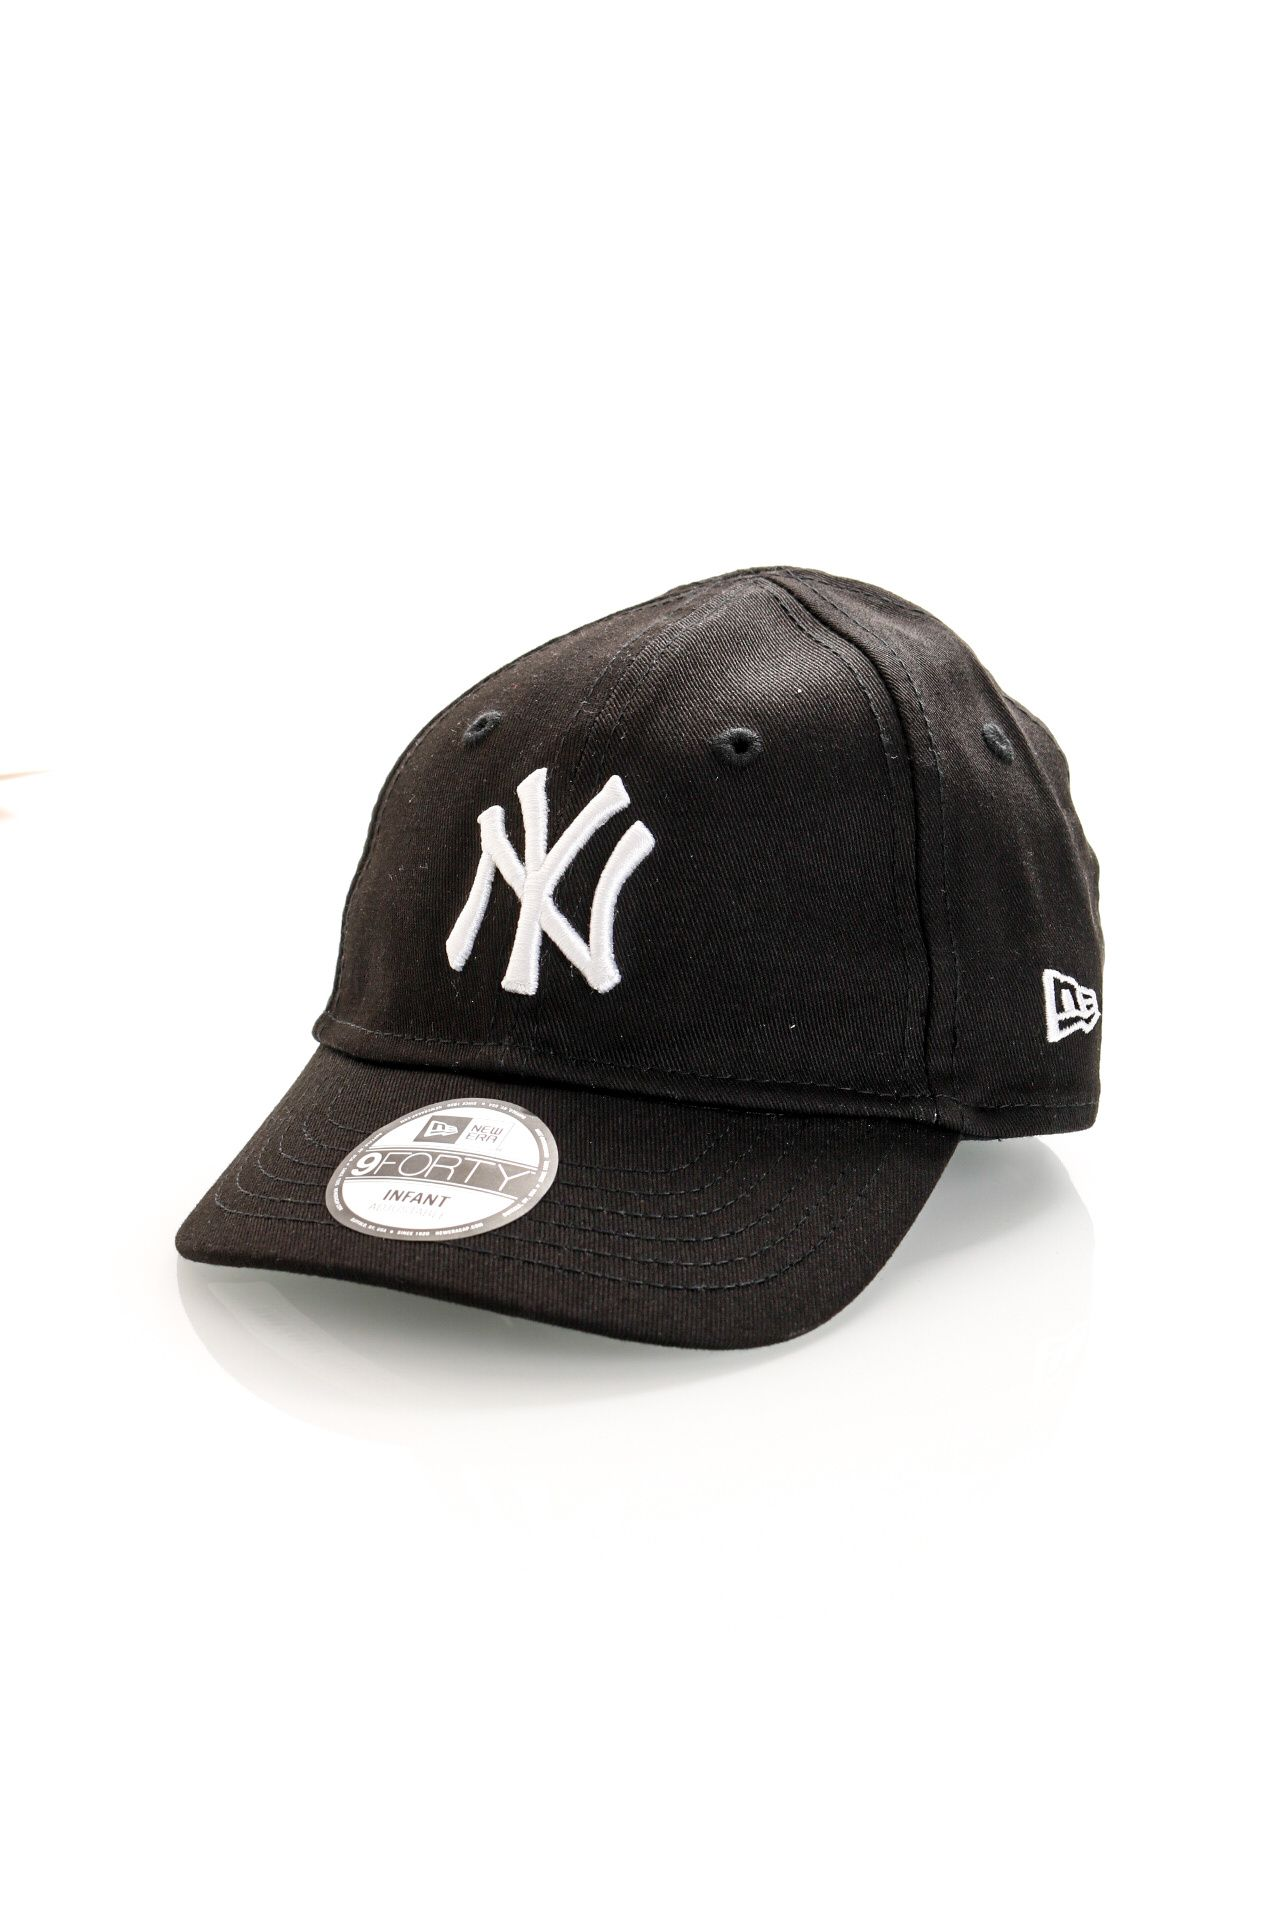 Afbeelding van New Era Dad Cap New York Yankees KIDS MY FIRST 9FORTY Black/White 12051995